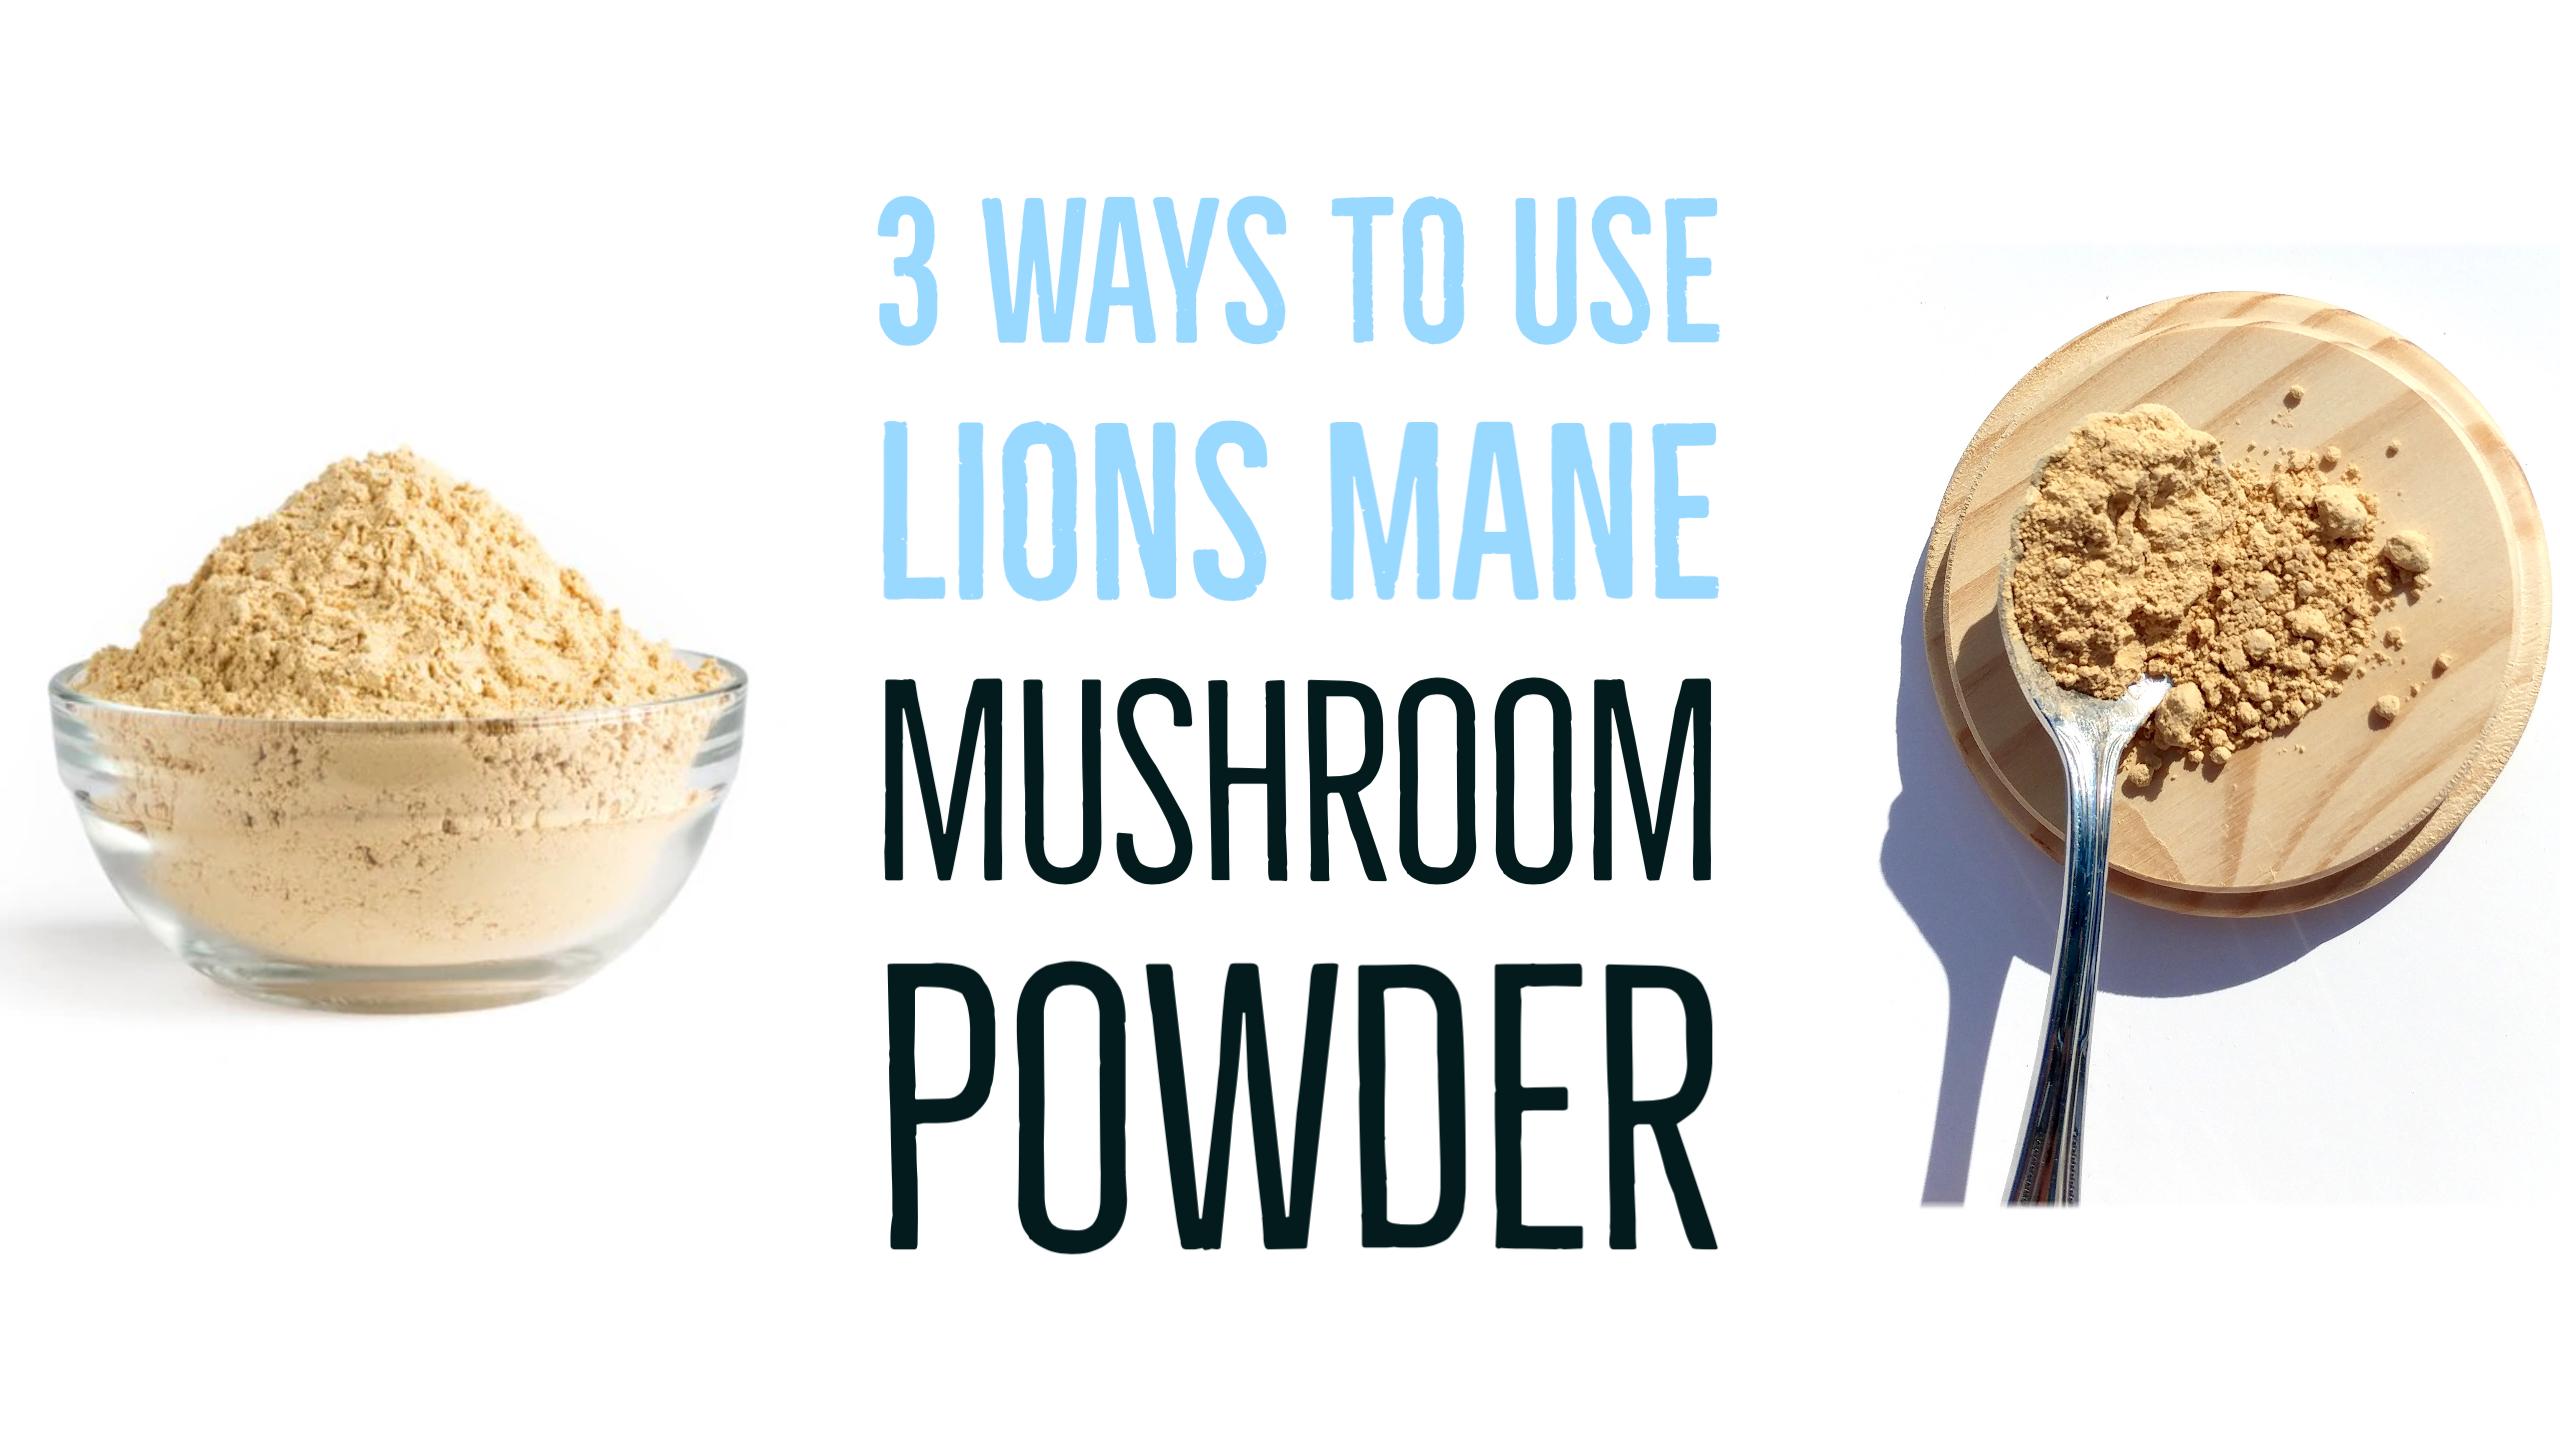 USDA Organic Lion's Mane Mushroom Powder - (3 Month Supply + 100 Servings) Log Grown 100% Fruit Body, Vegan, Memory, Focus, Cognition, Mental Clarity, Nerve Health, 200g